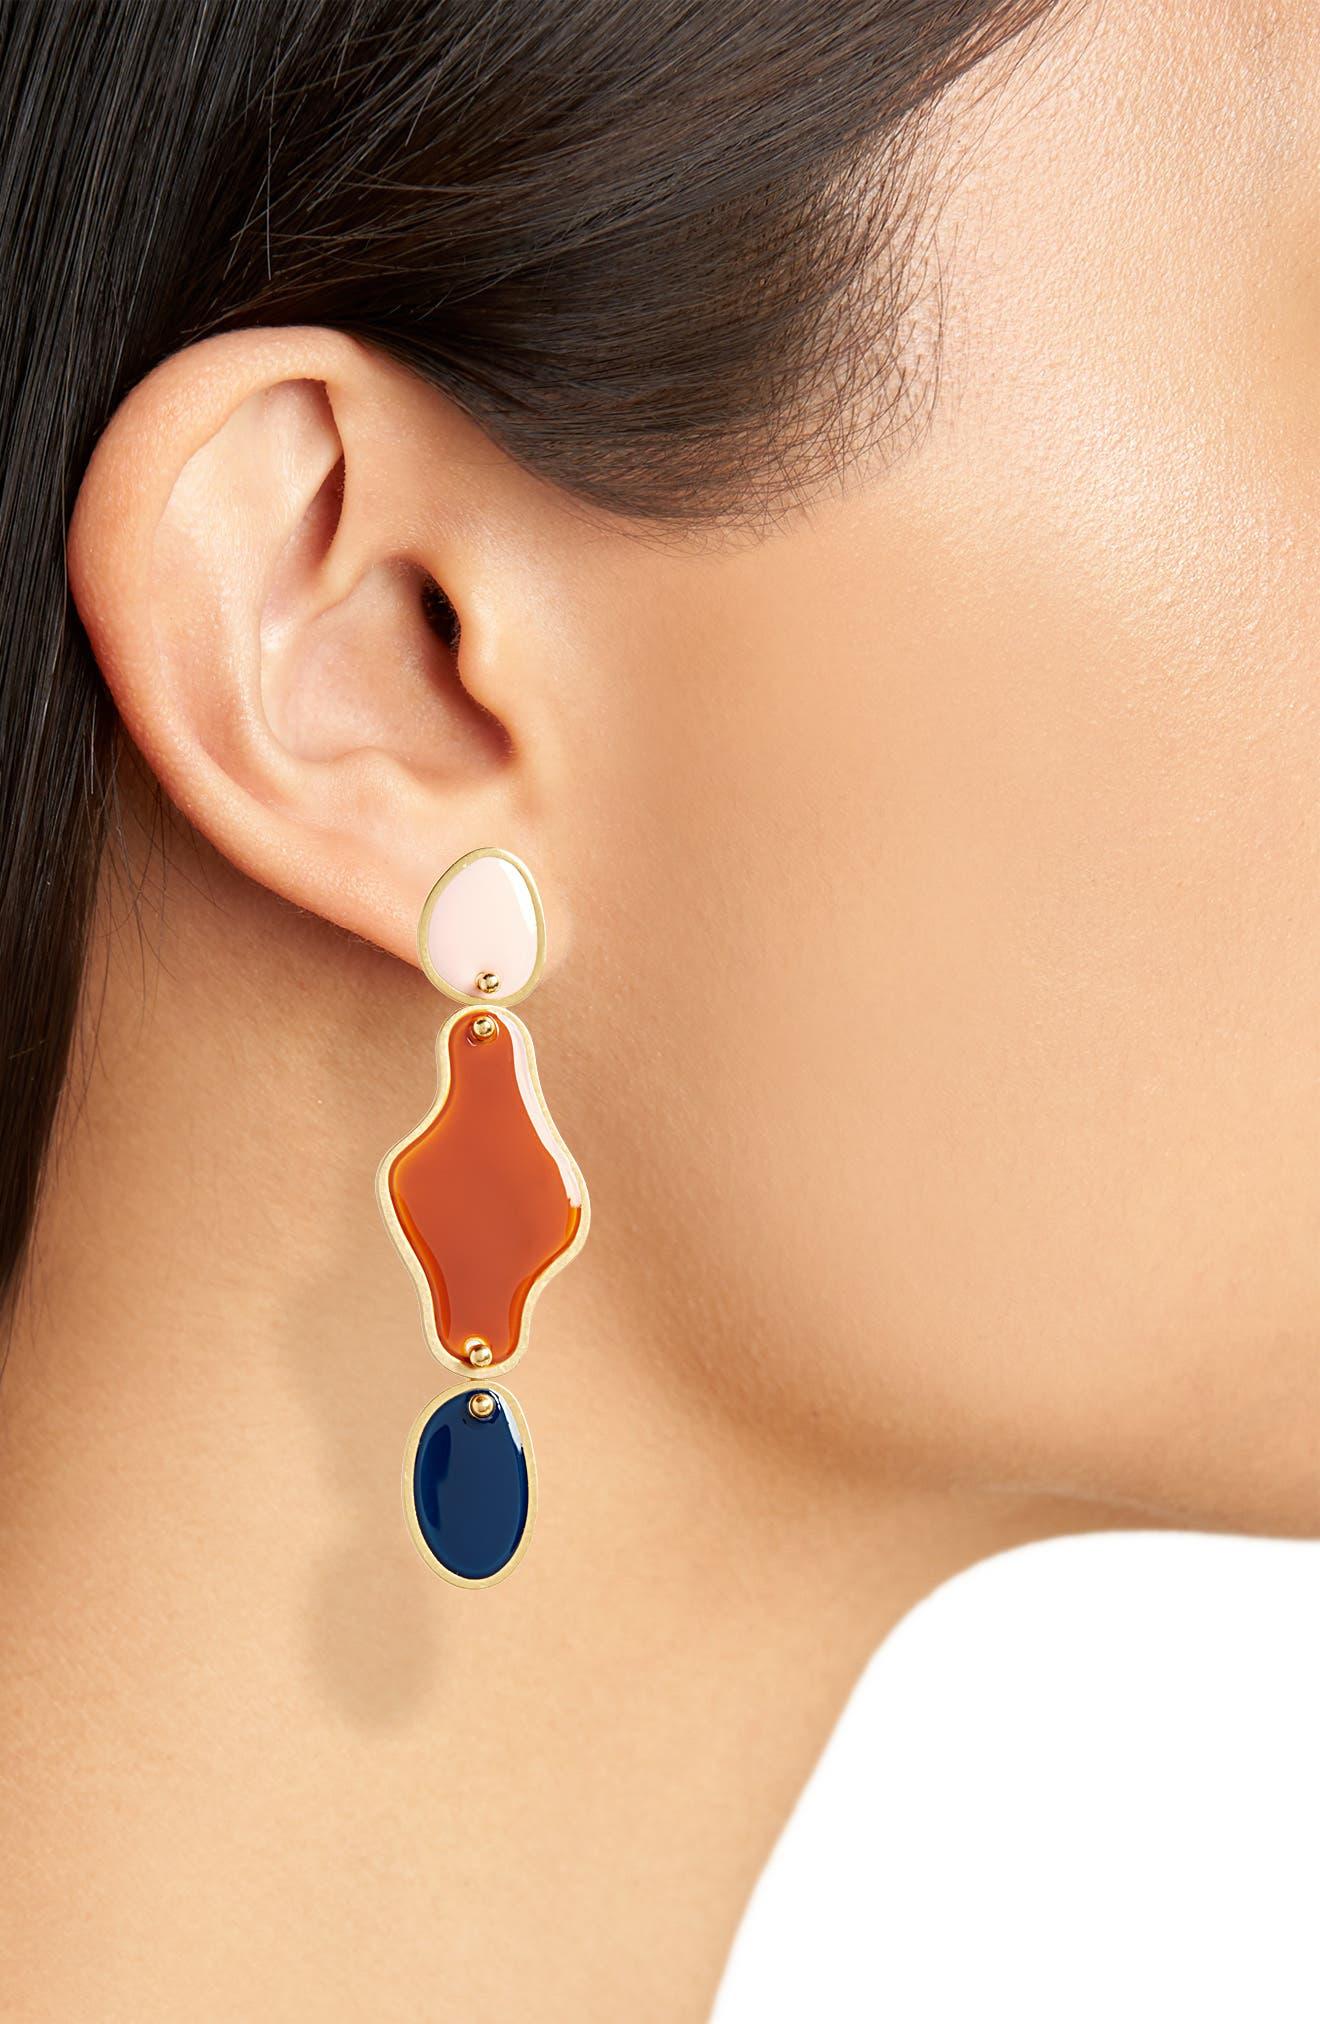 Freeform Statement Earrings,                             Alternate thumbnail 2, color,                             400